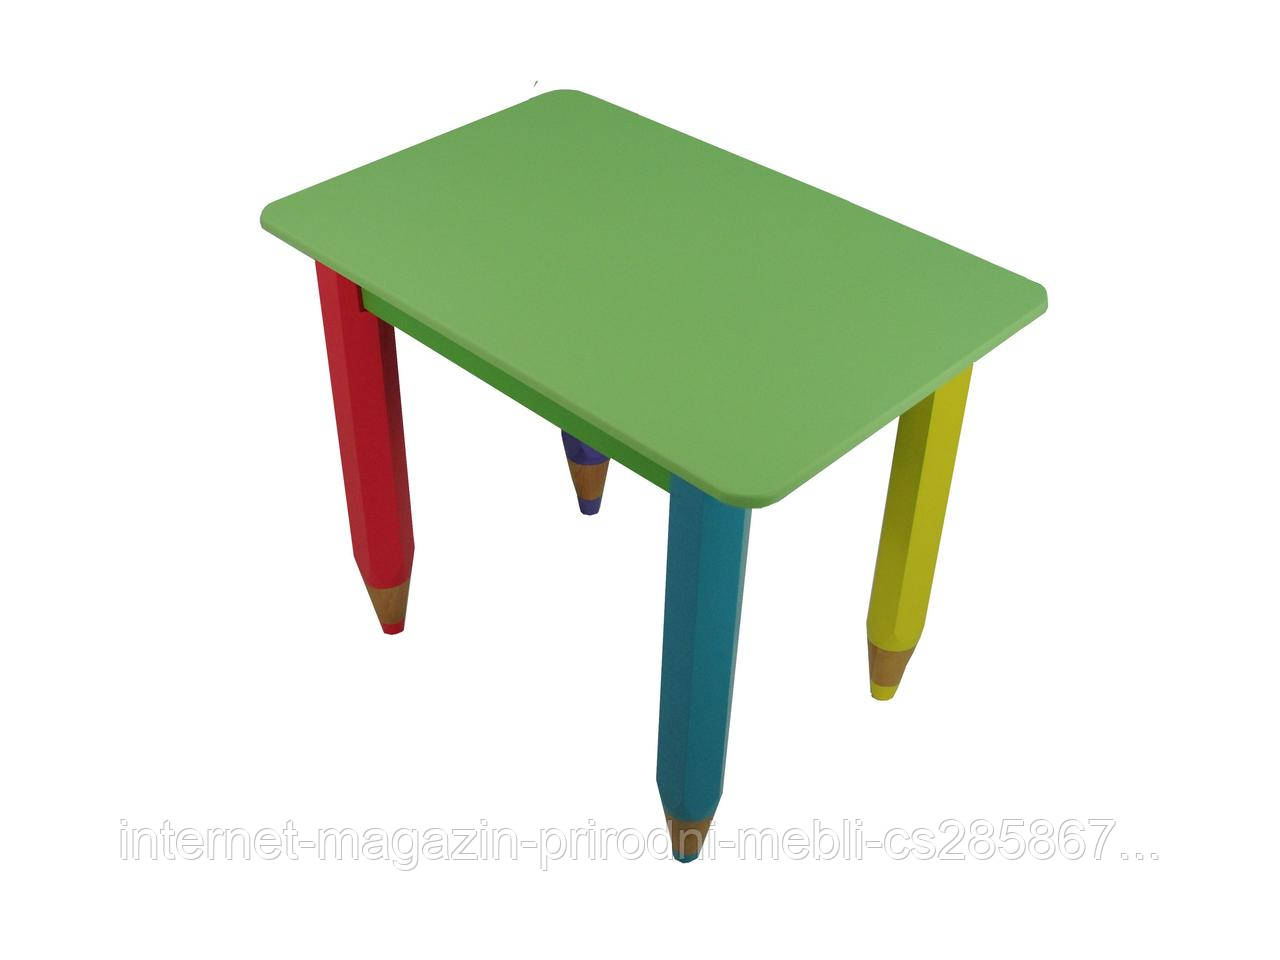 Стол карандашики 60*60 с пеналом